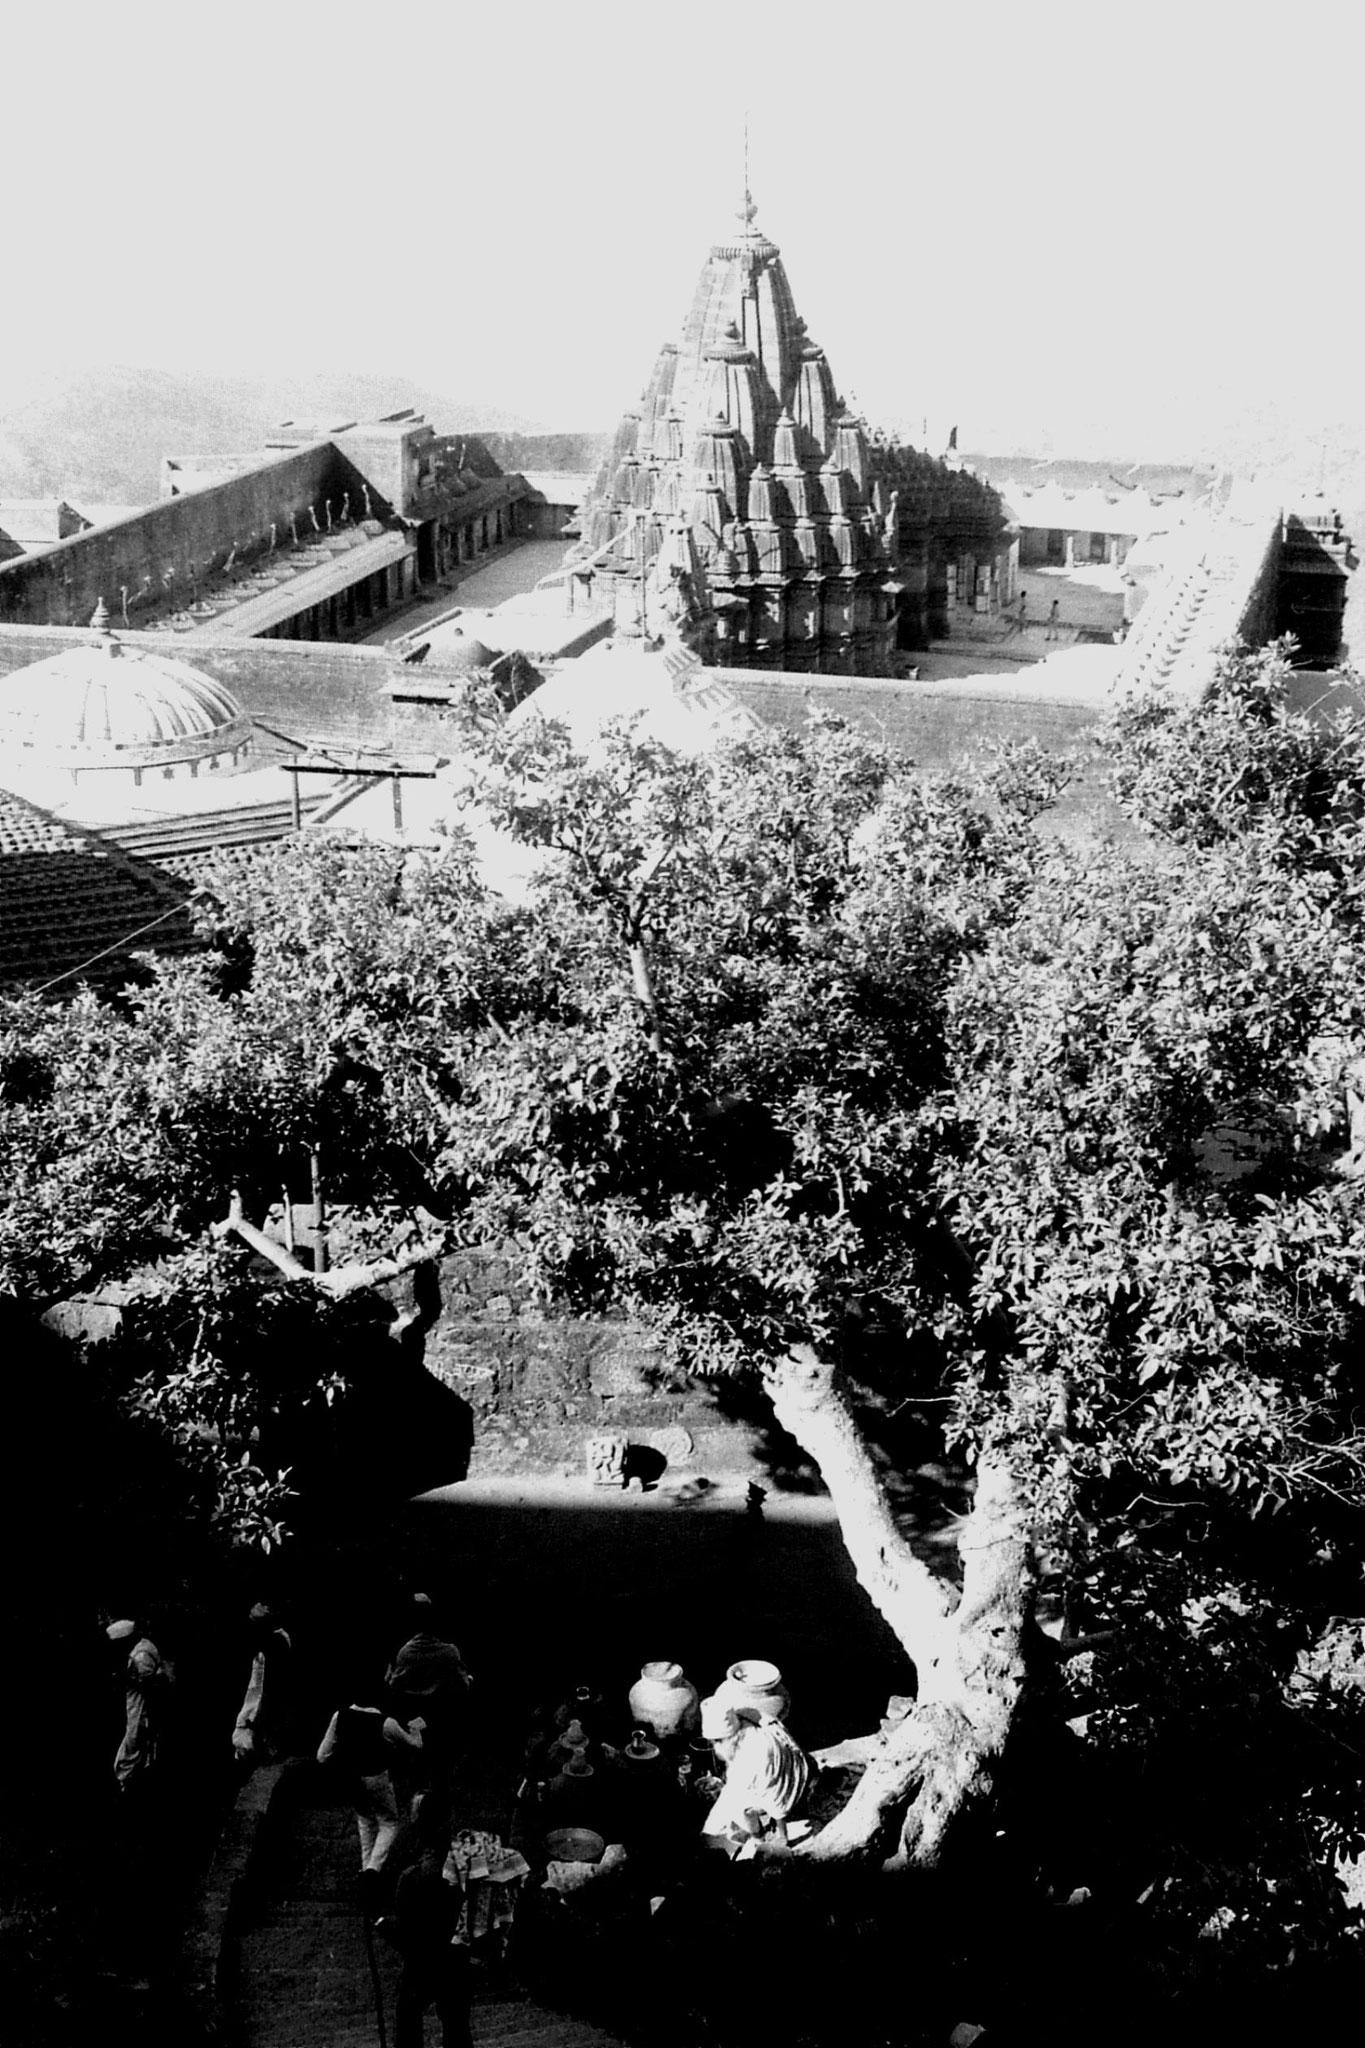 12/12/1989: 29: Junagardh, sadhu under tree